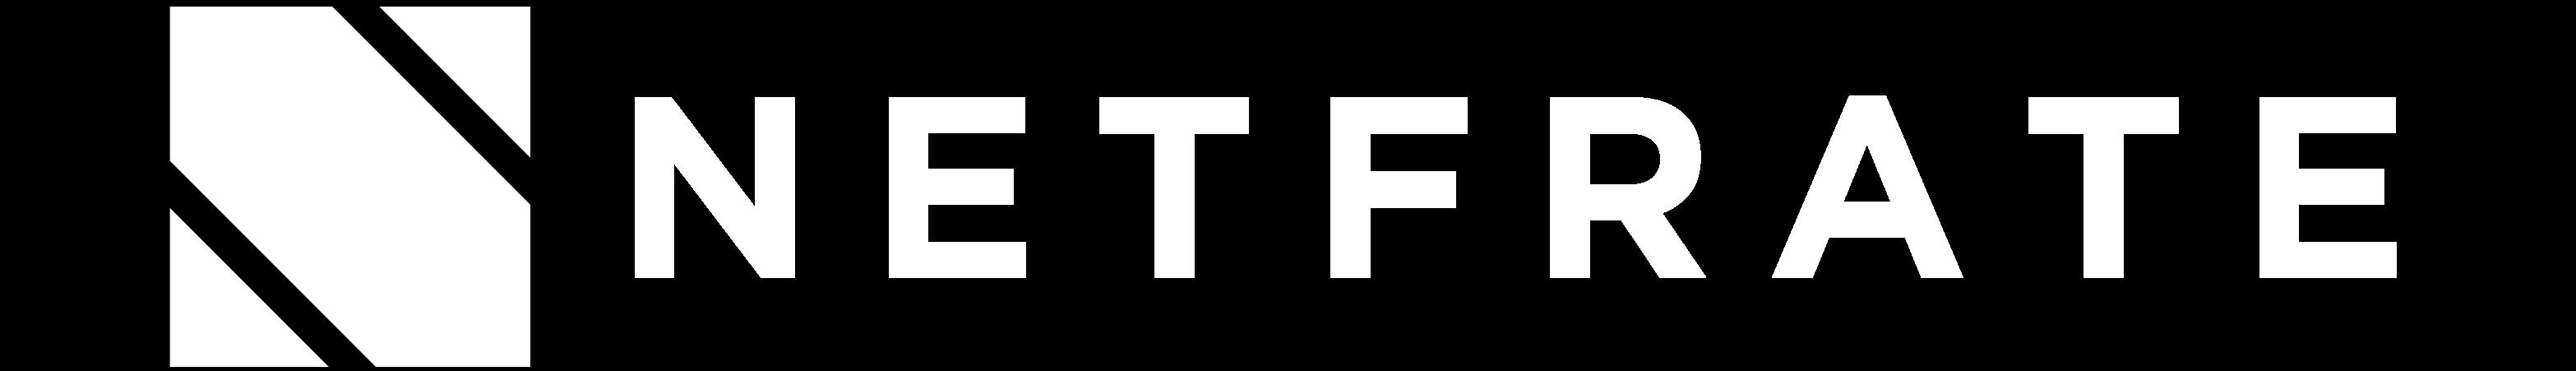 Netfrate LLC